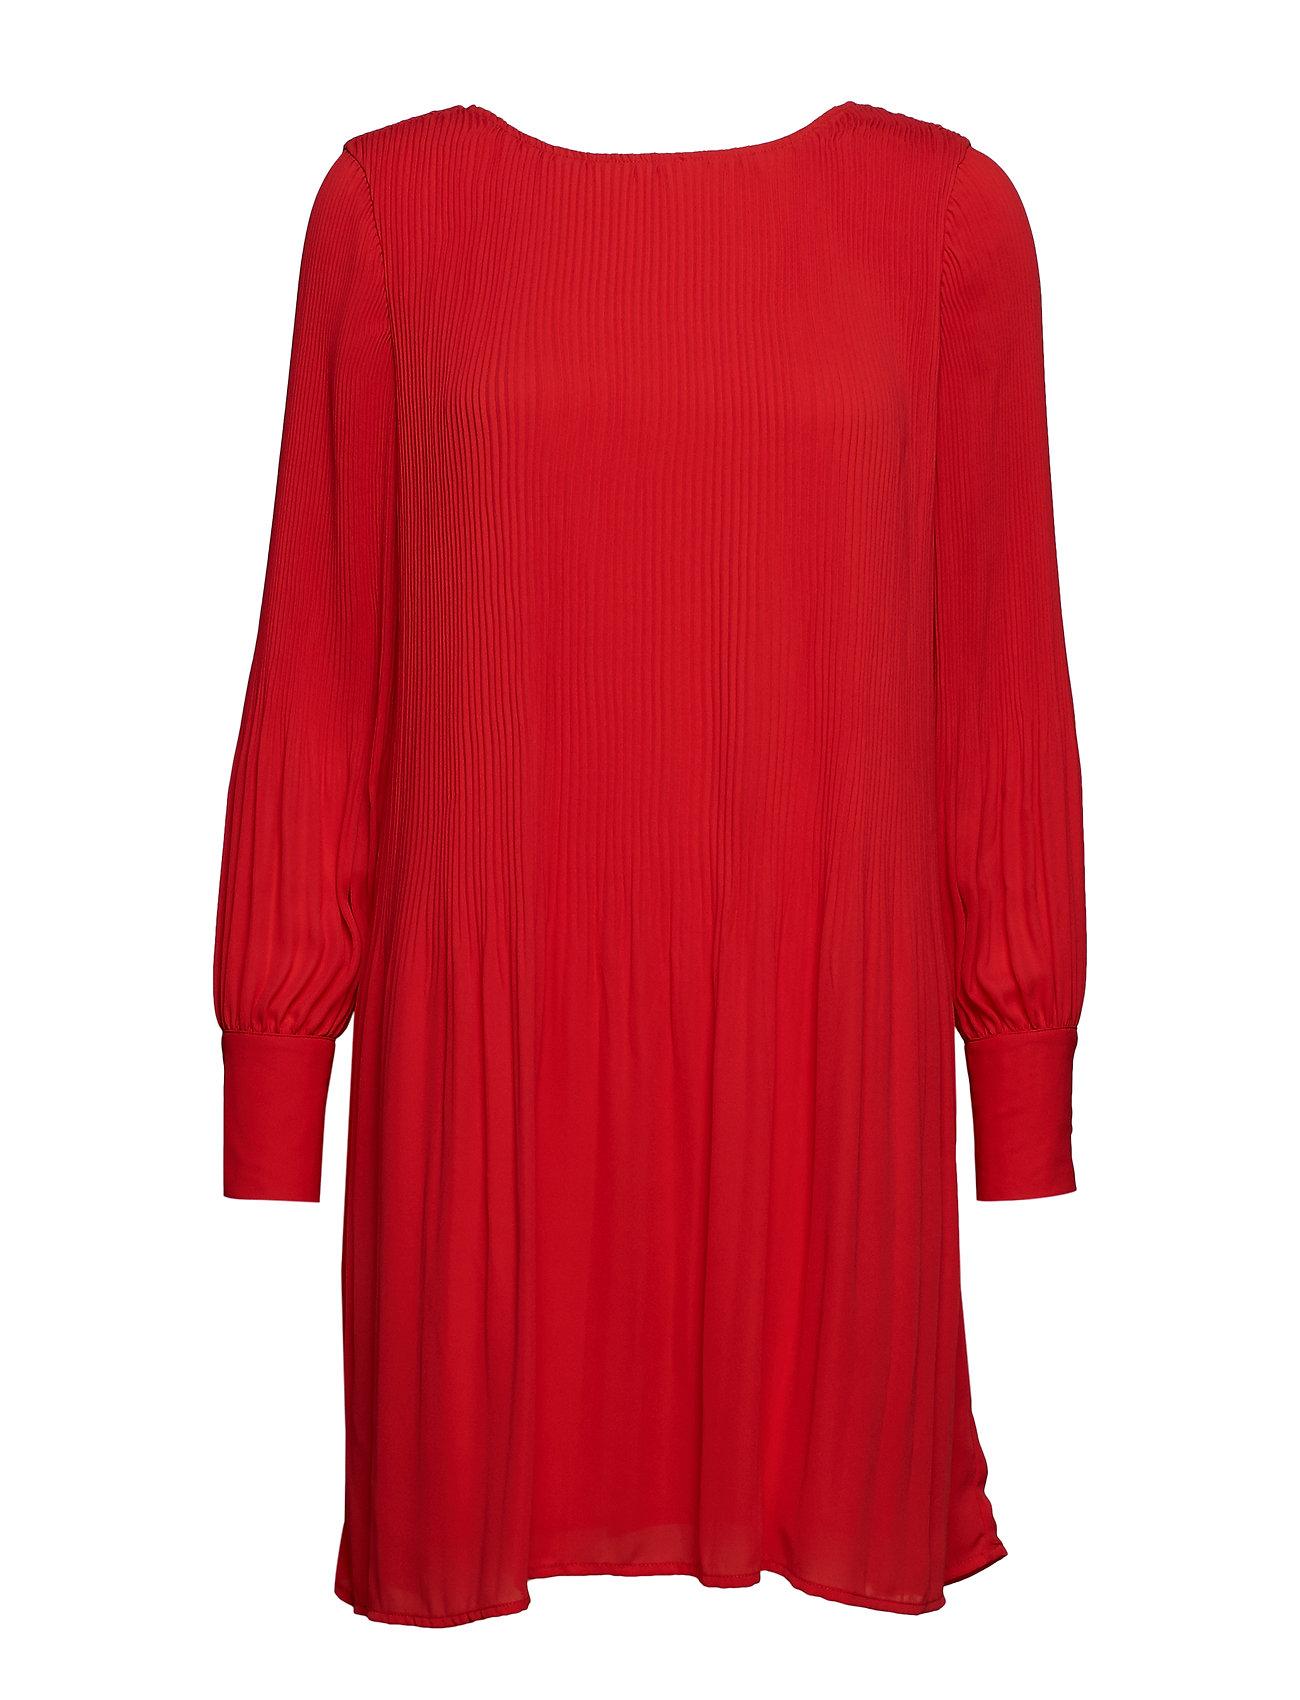 Selected Femme SLFPIPER LS SHORT PLISSE DRESS B - TRUE RED